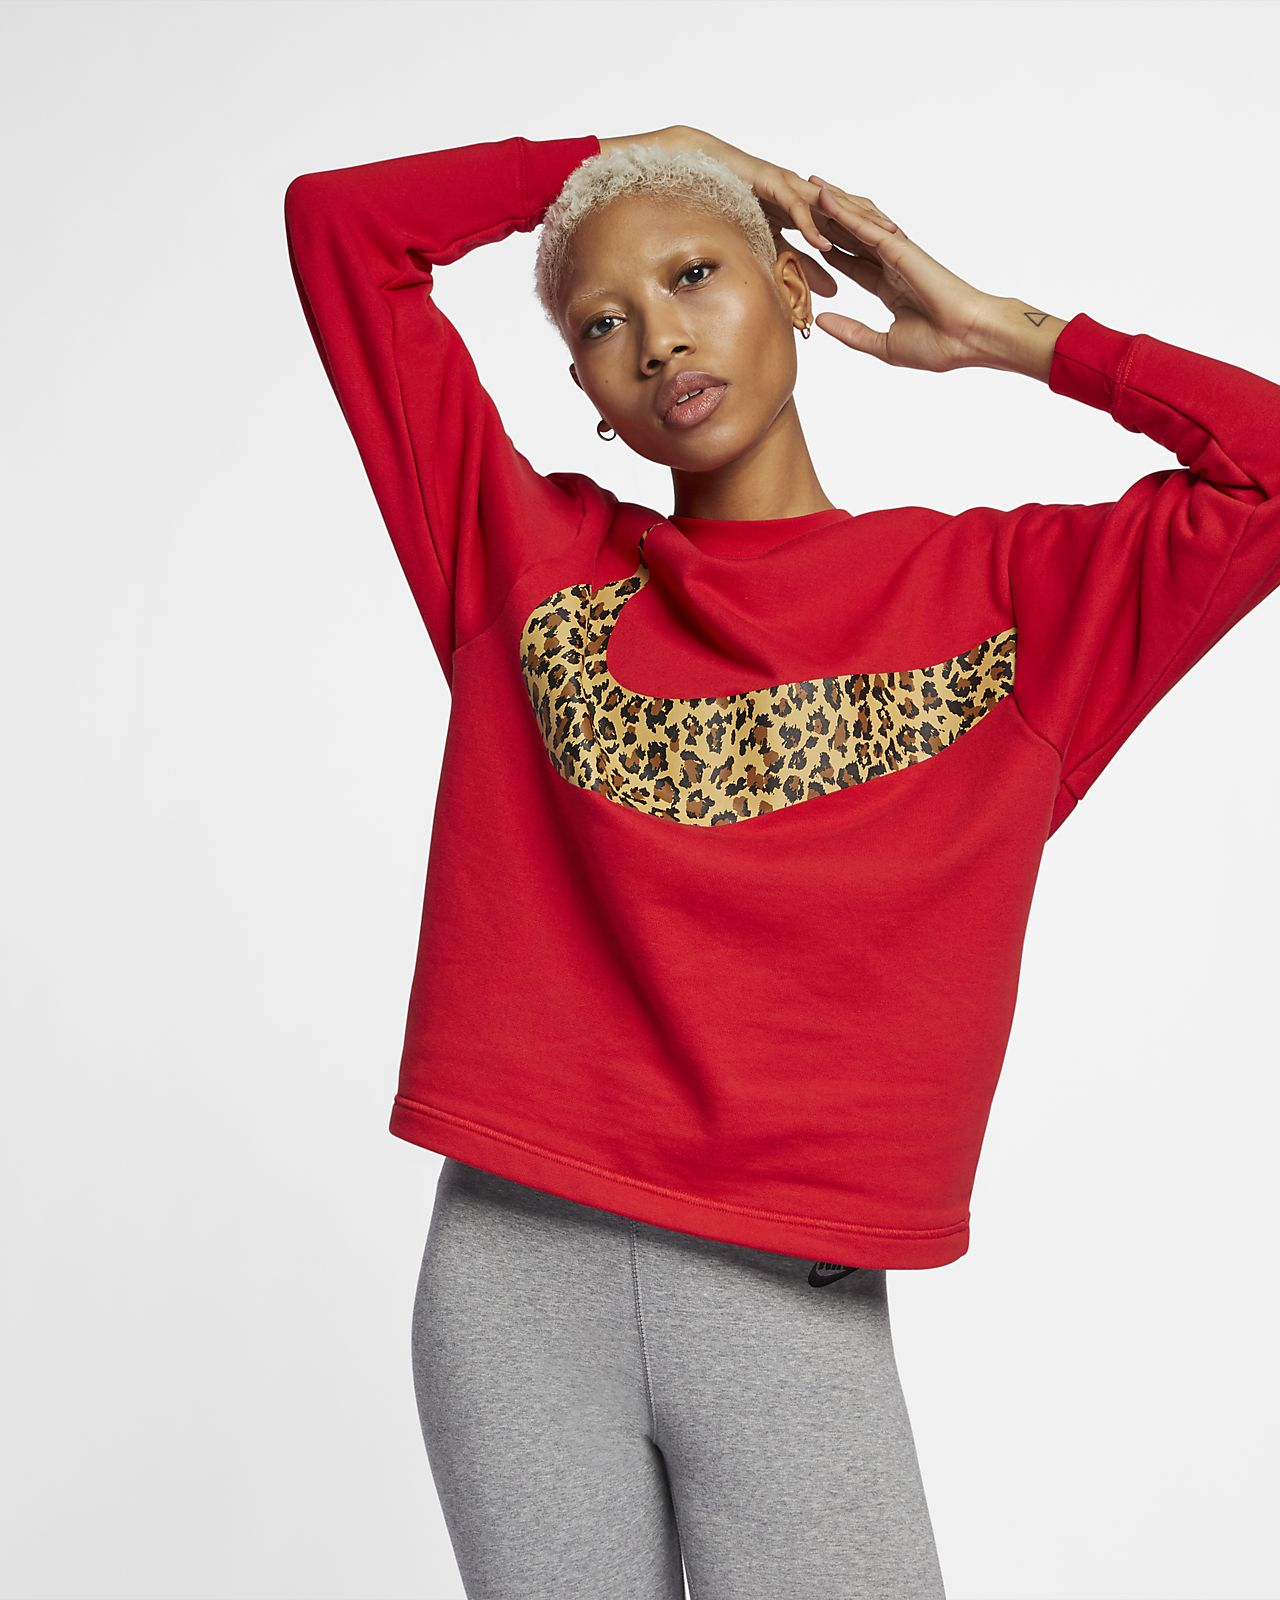 Nike Sportswear Damesshirt met dierenprint en ronde hals